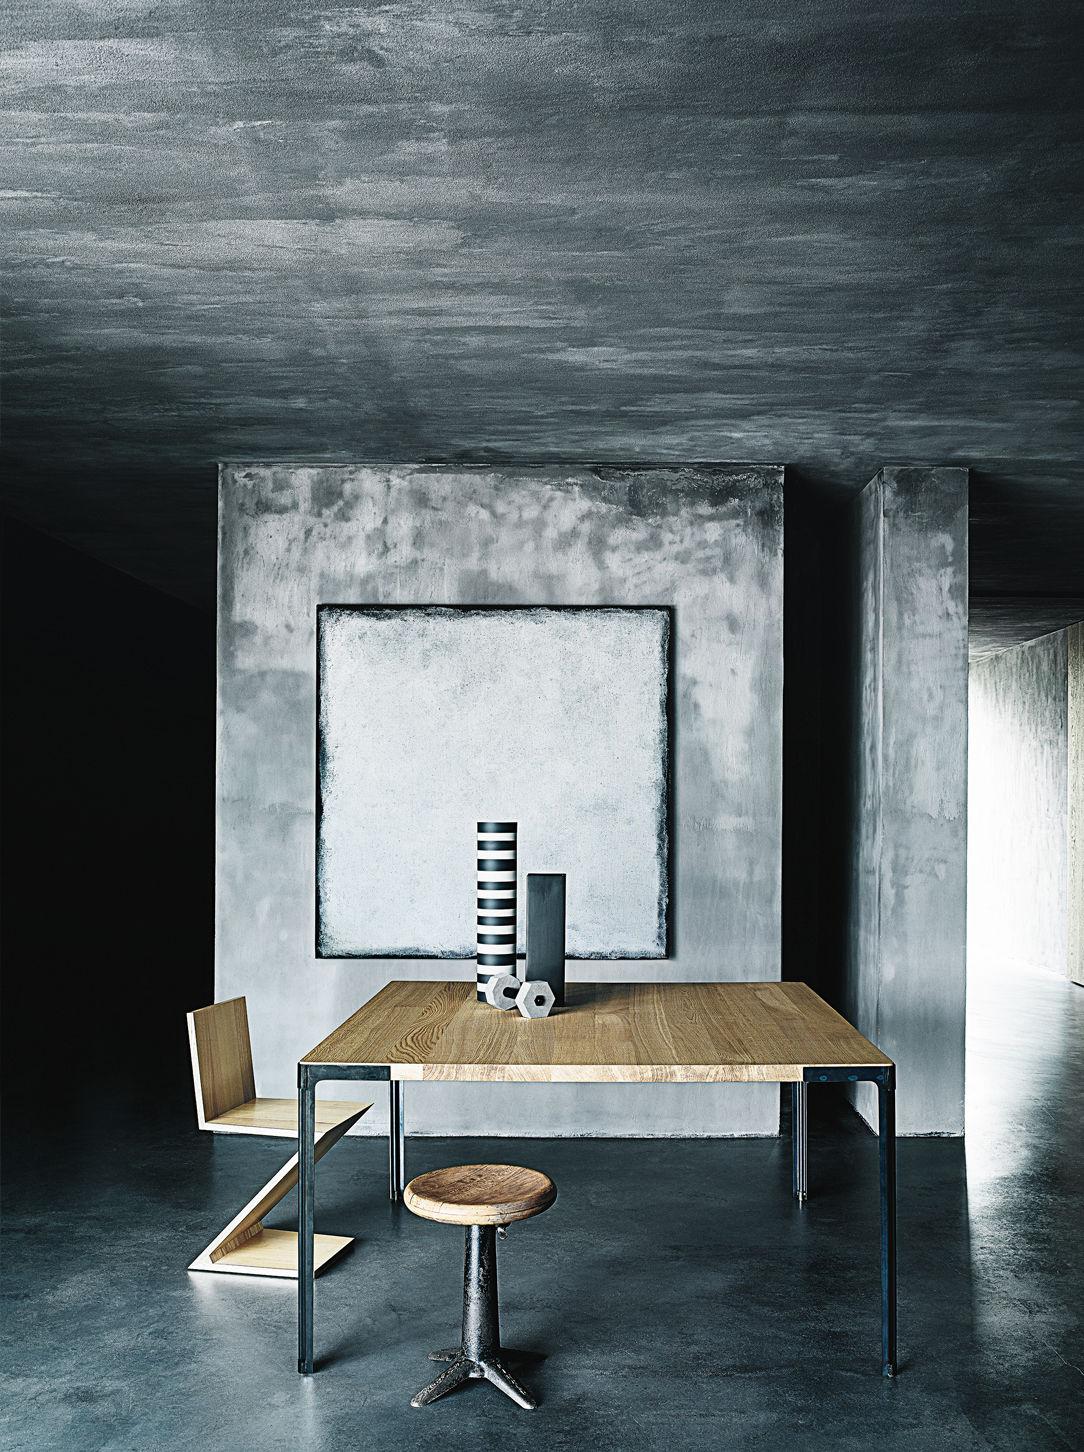 ... Moderner Tisch / Holz / Stahl / Keramik FAN DESALTO Spa ...